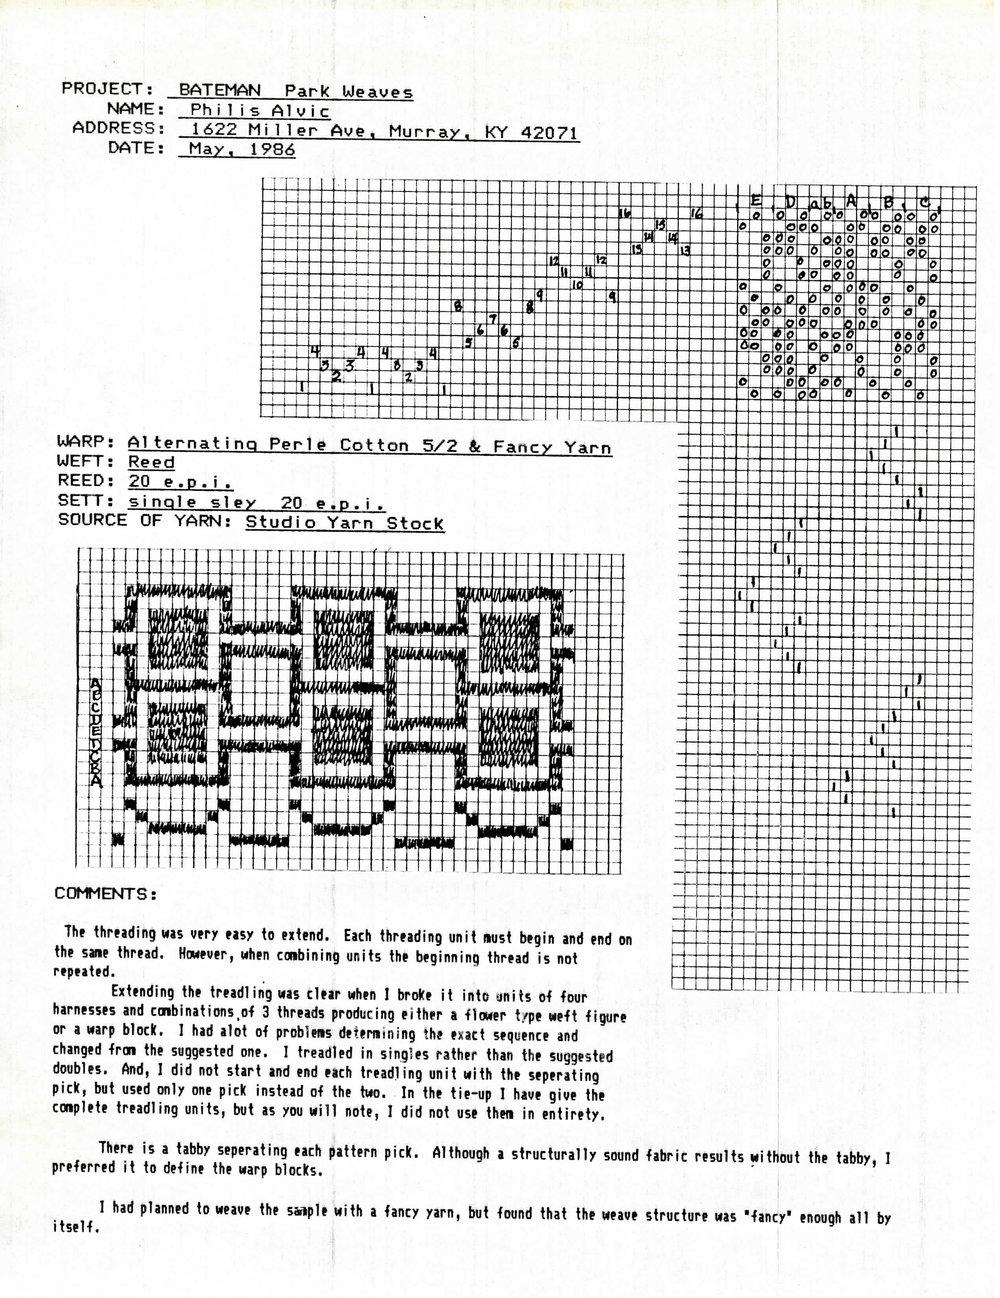 1986_Page_1_Image_0001.jpg